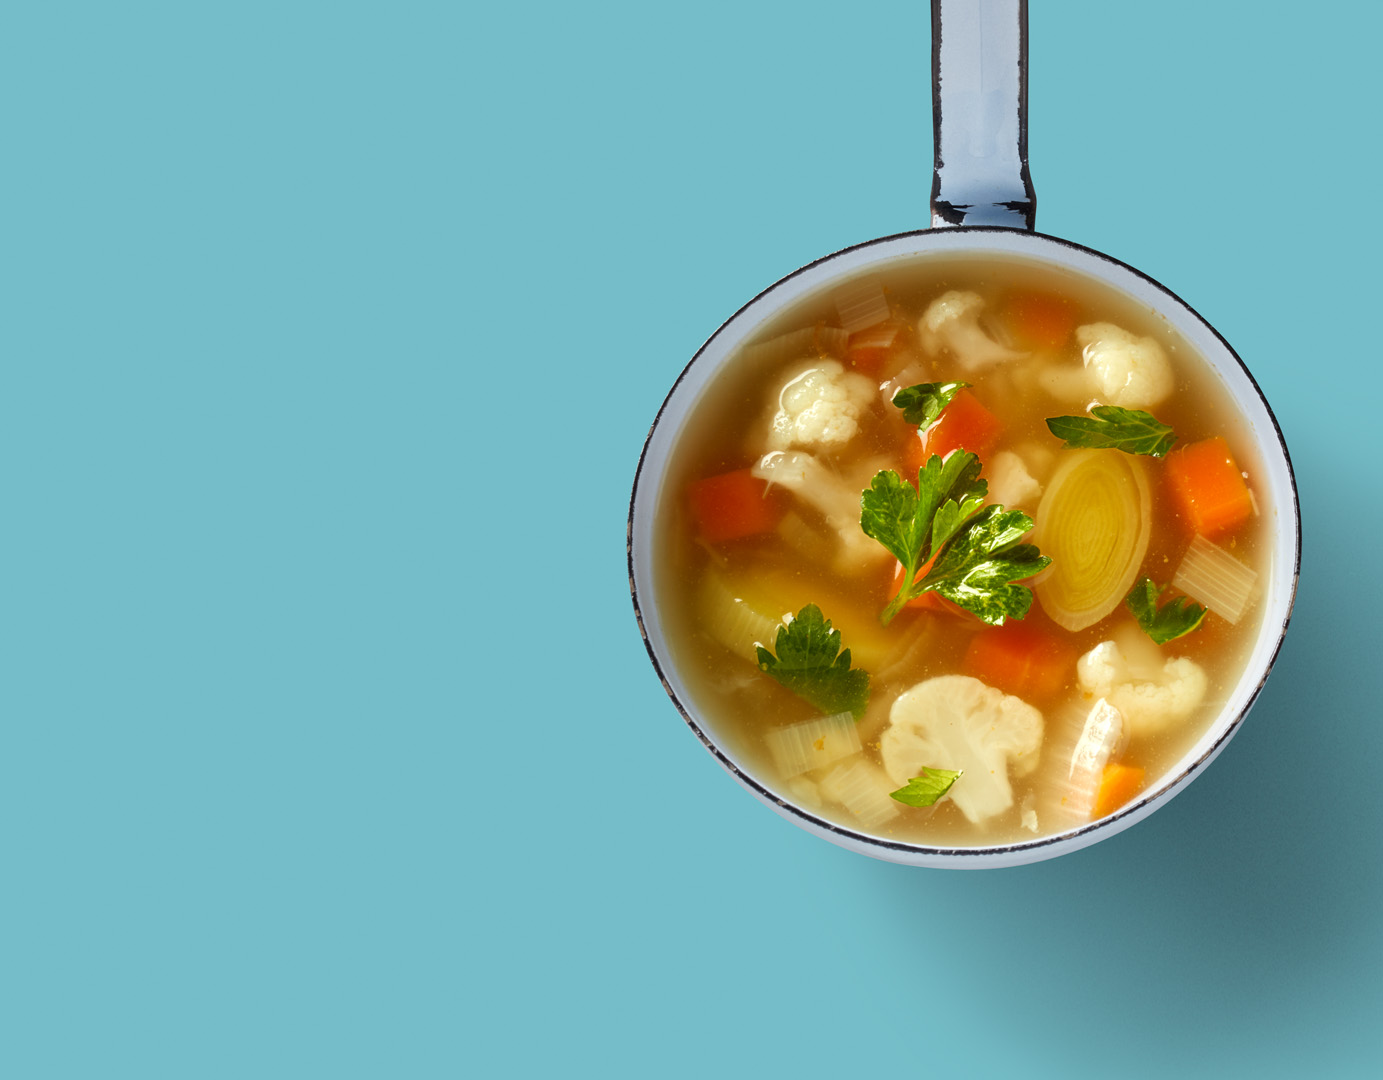 Floris Holtland - packaging photography - meal - vegetables soup